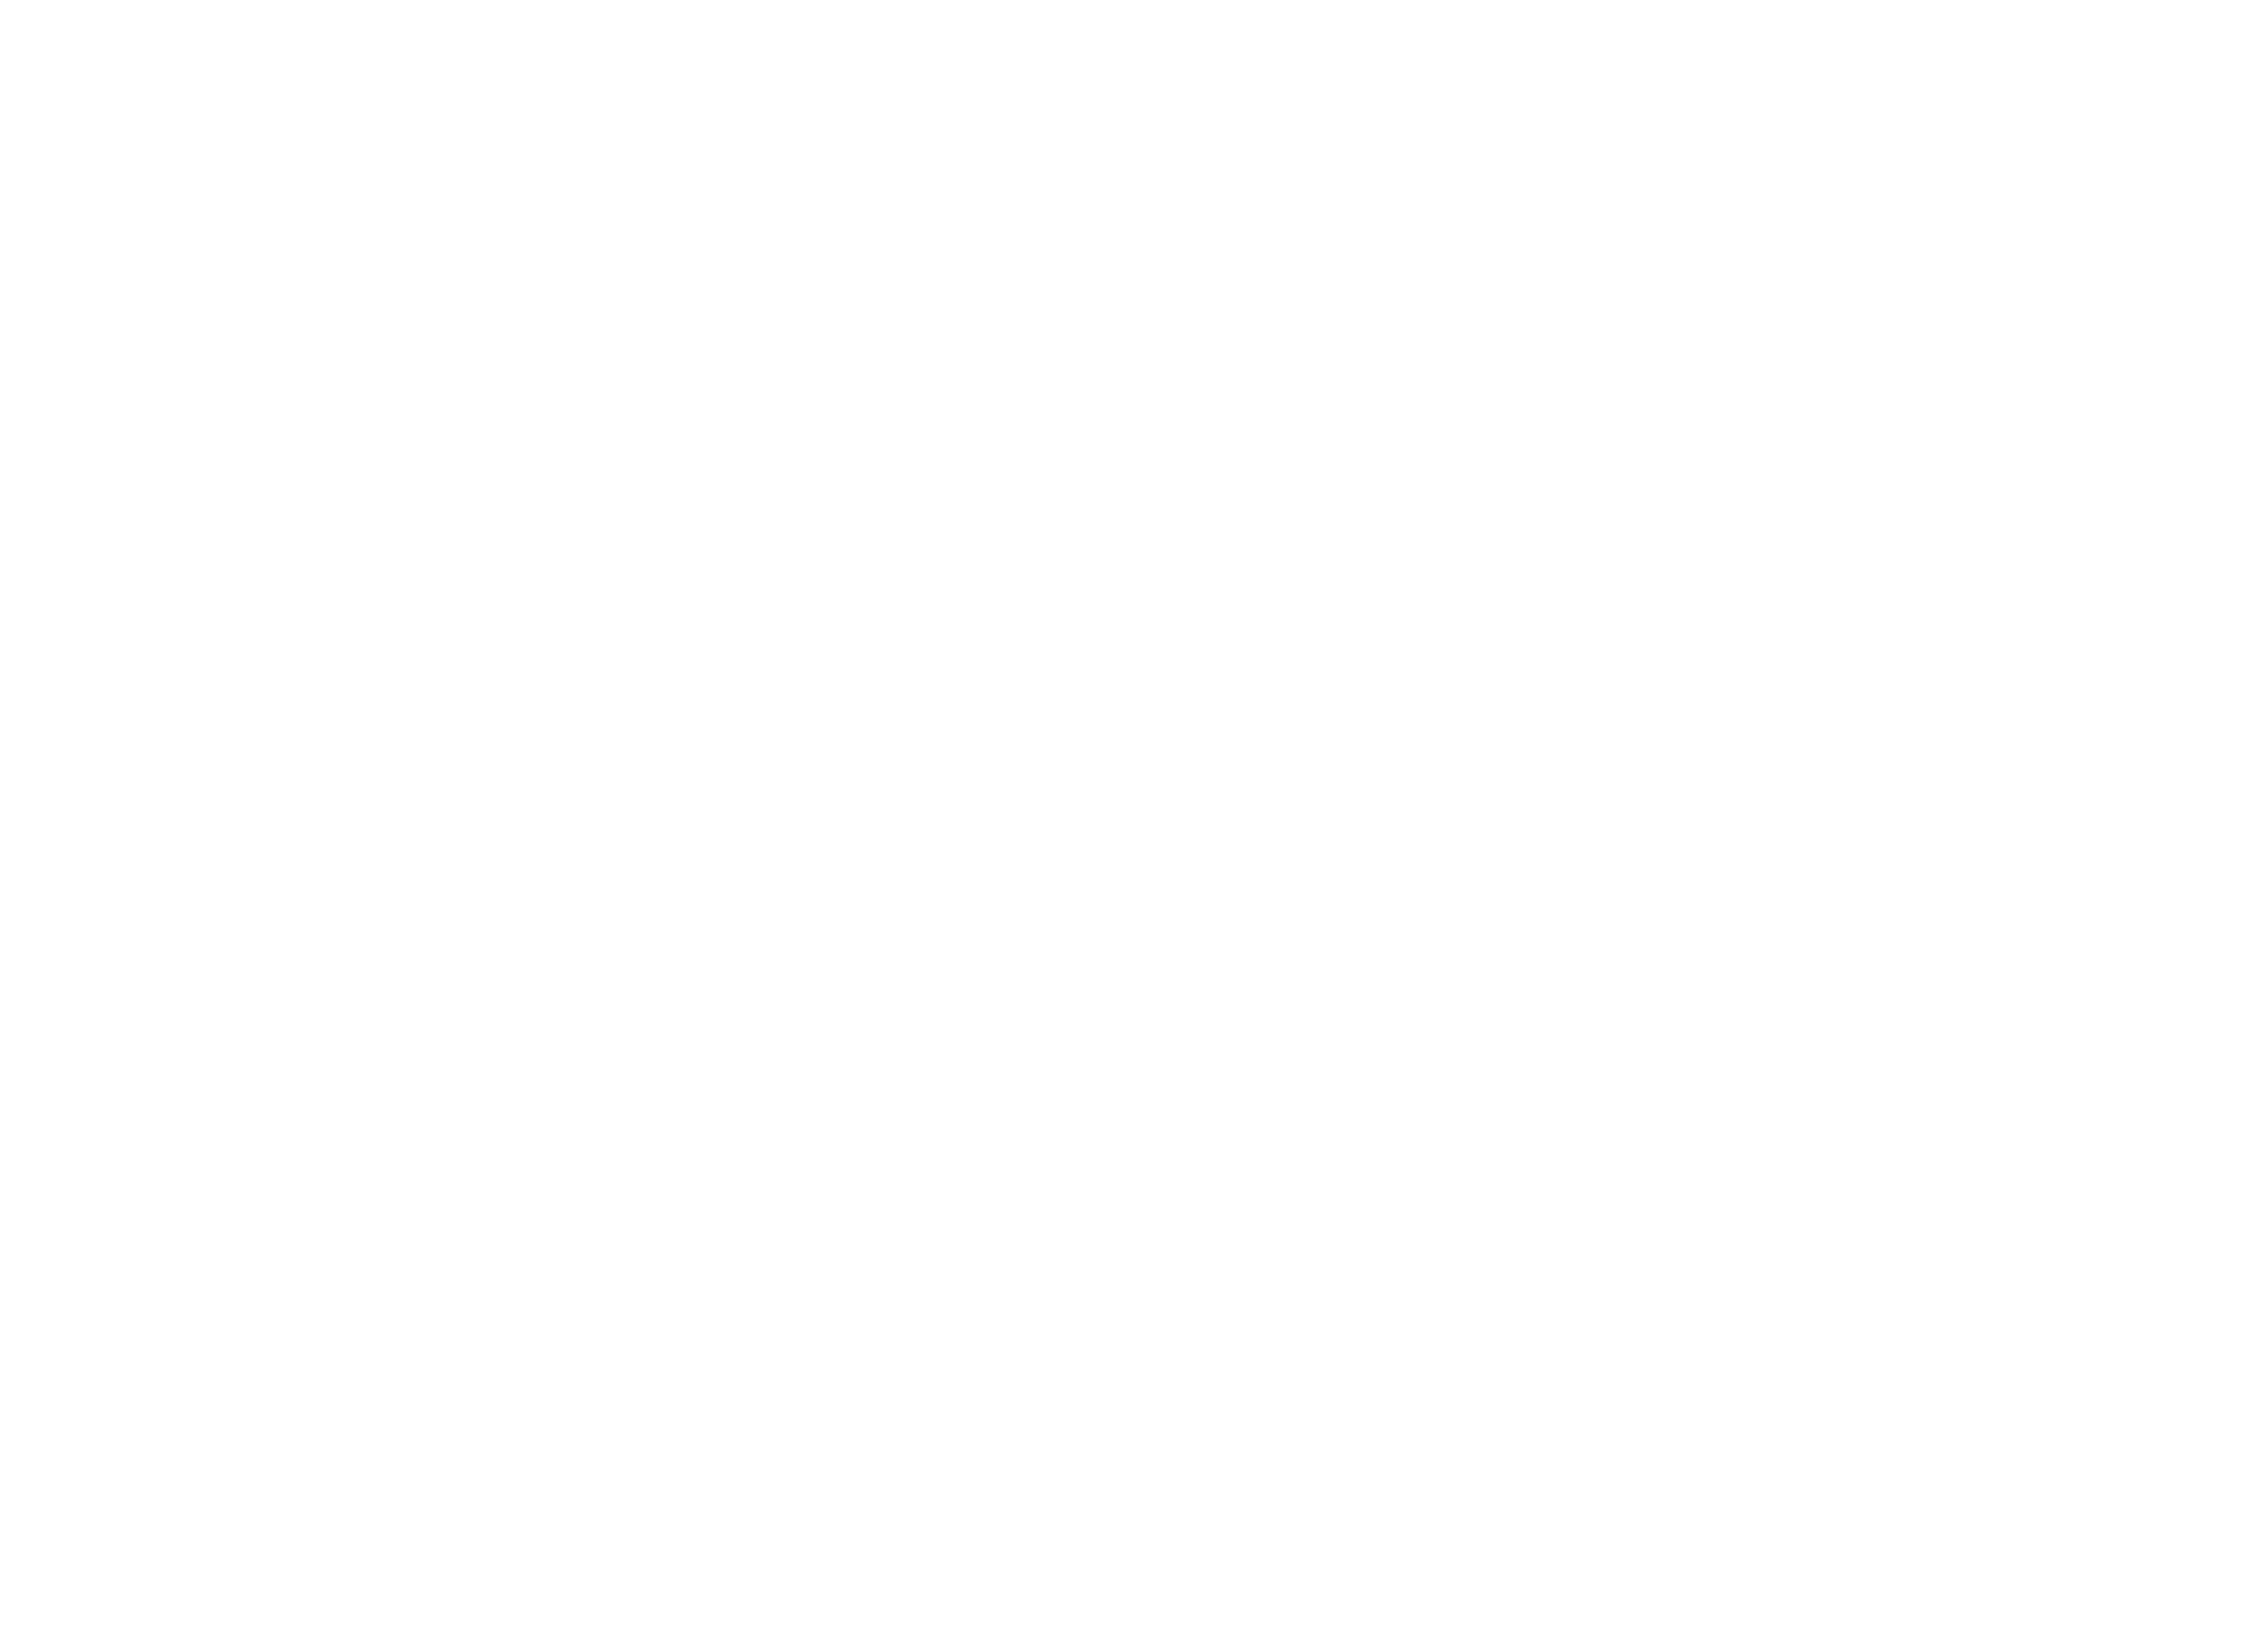 logo fundacji im. Batorego